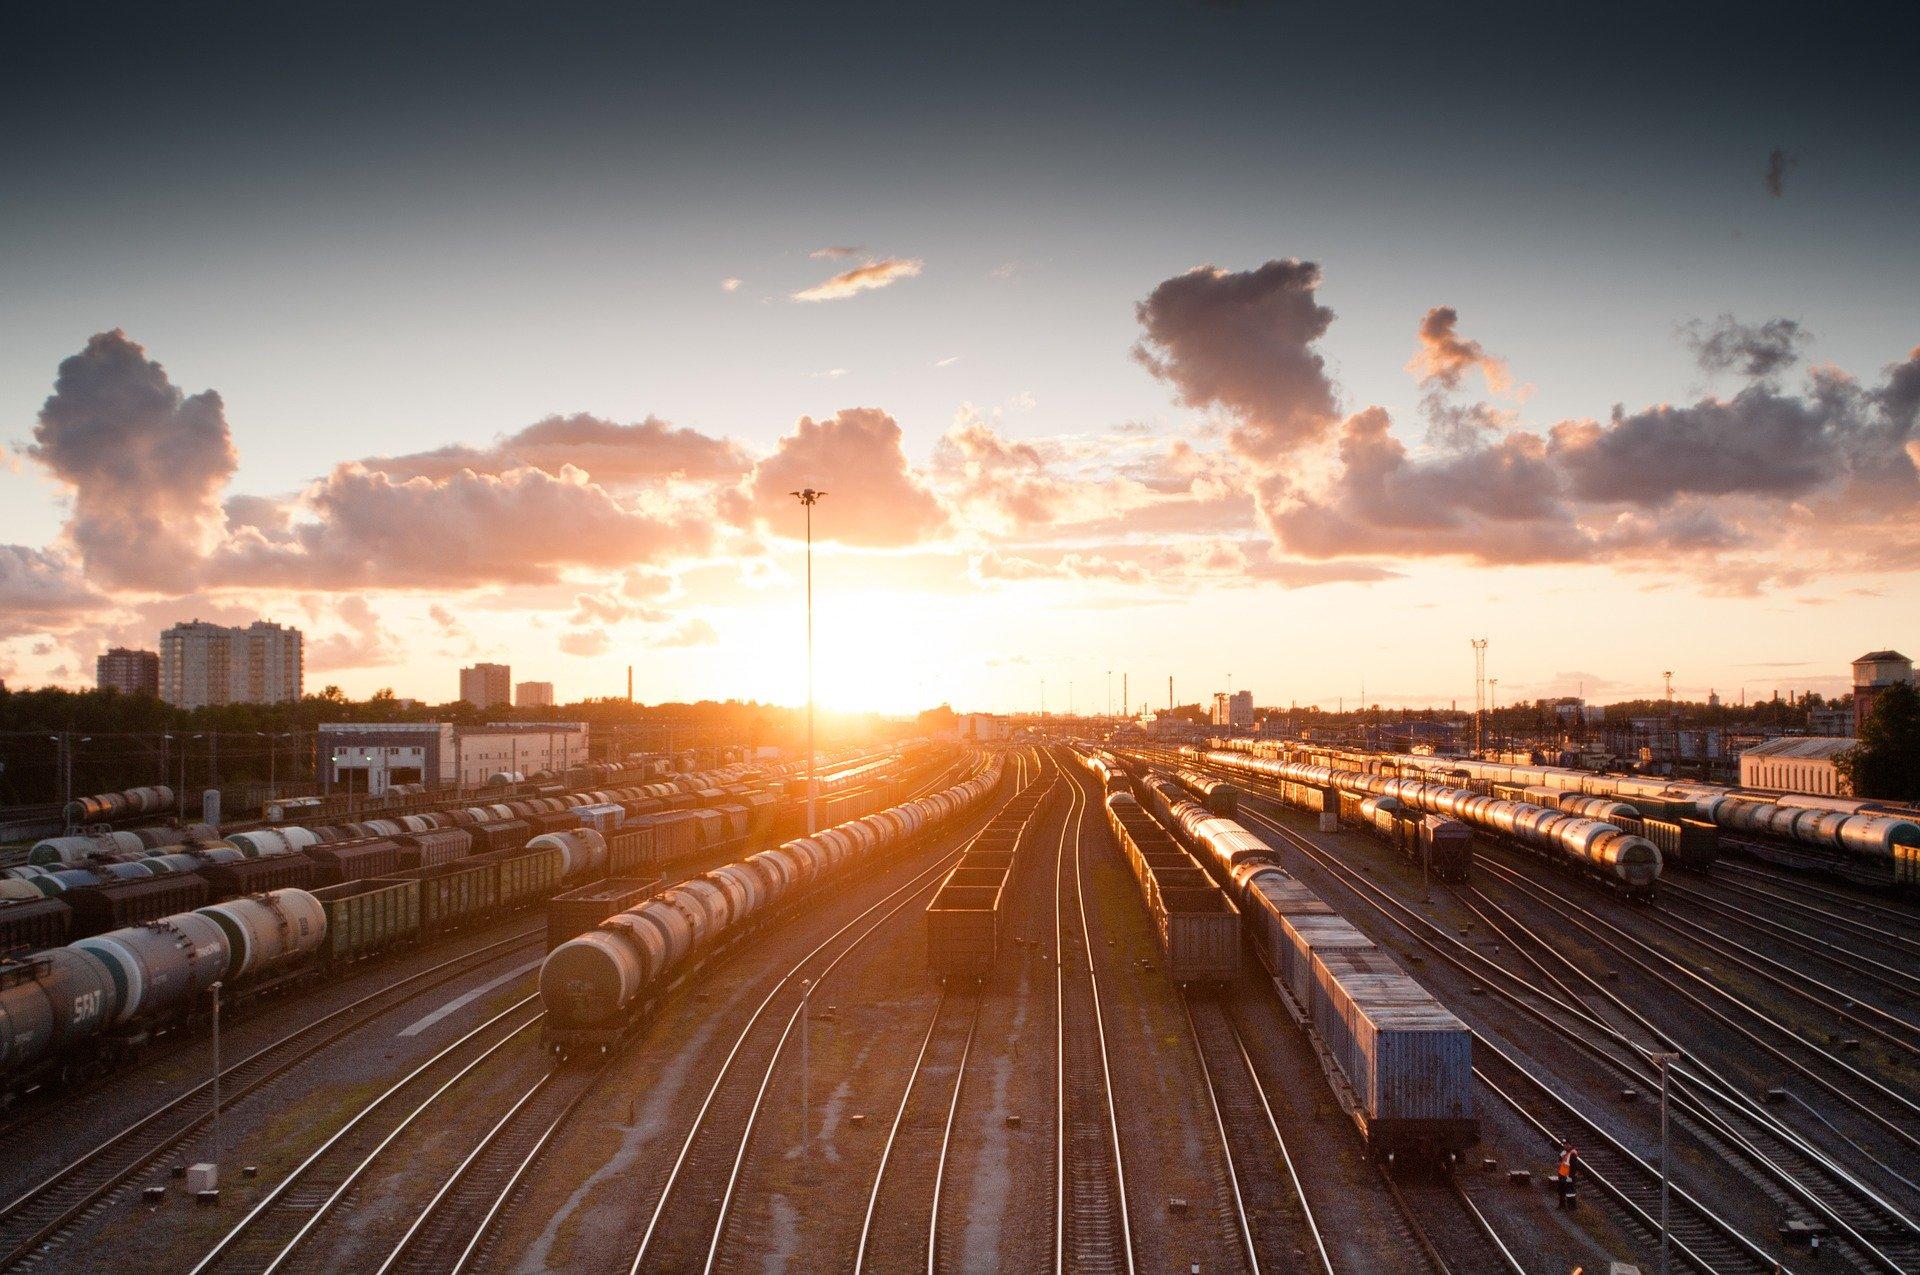 treni fermi al tramonto